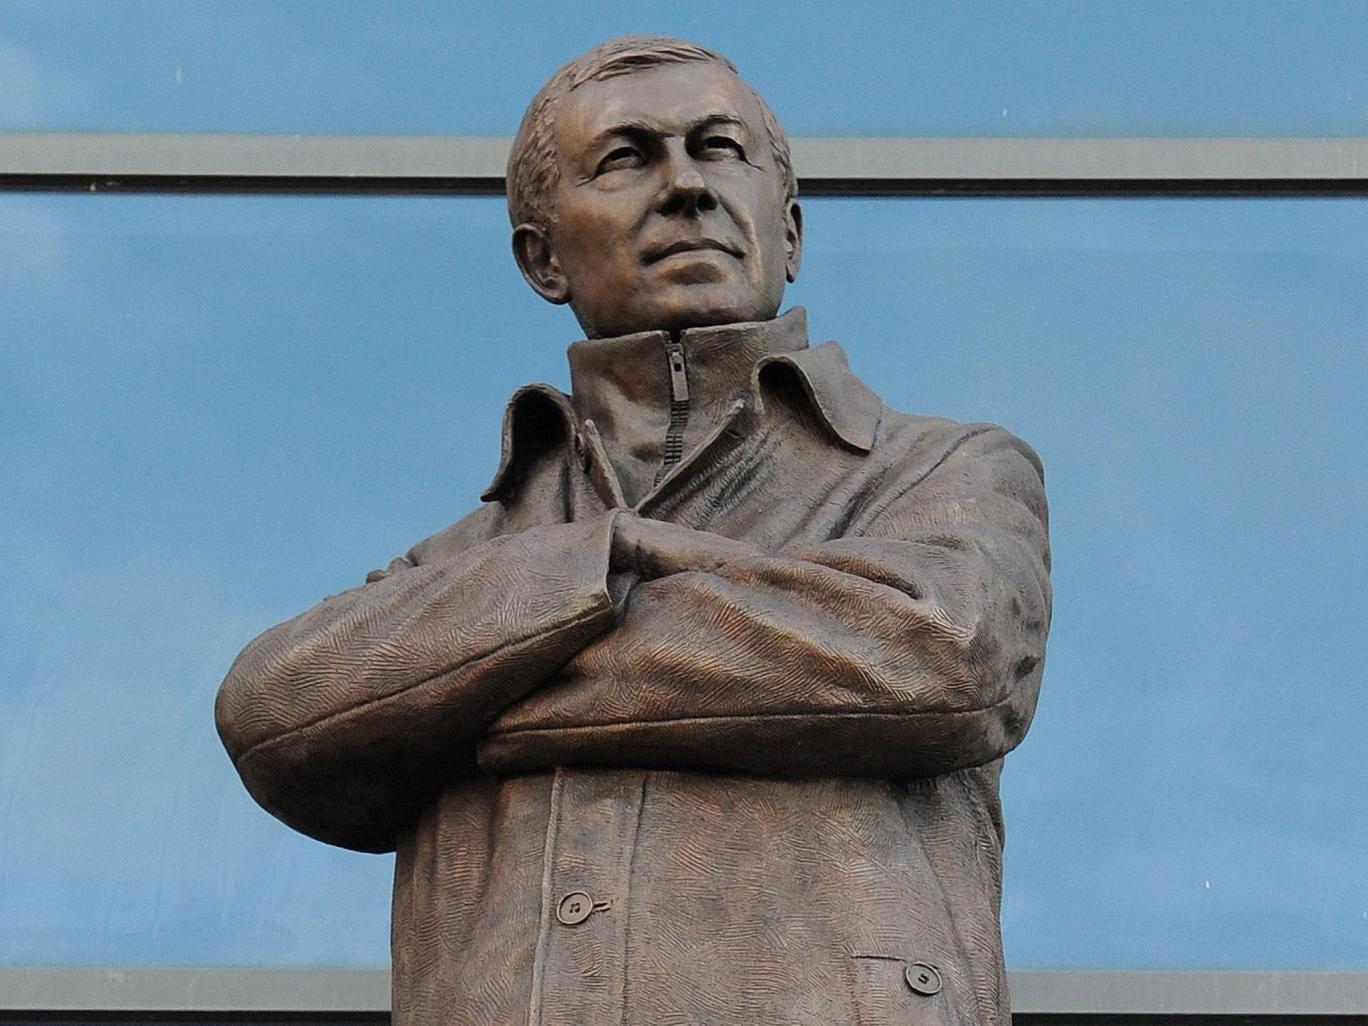 Silence is bronze: A strangely happy-looking statue of Sir Alex Ferguson